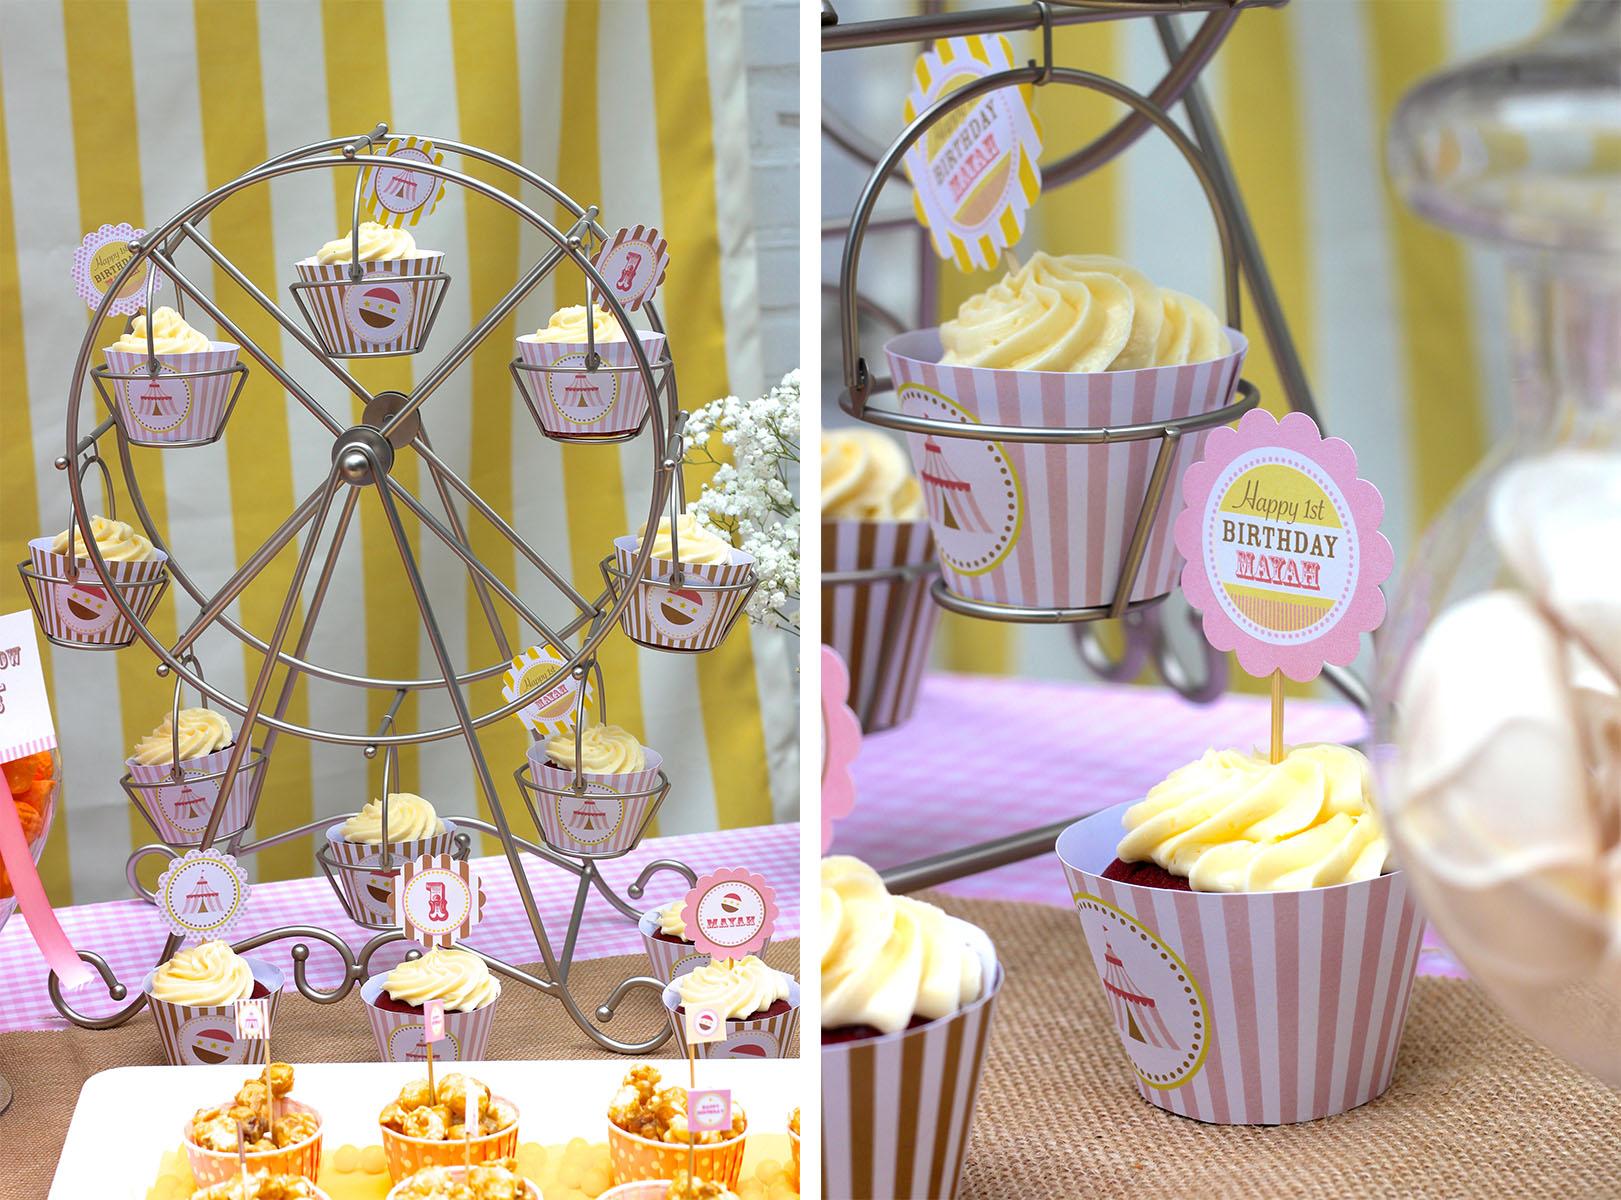 Wheel Cupcake stand